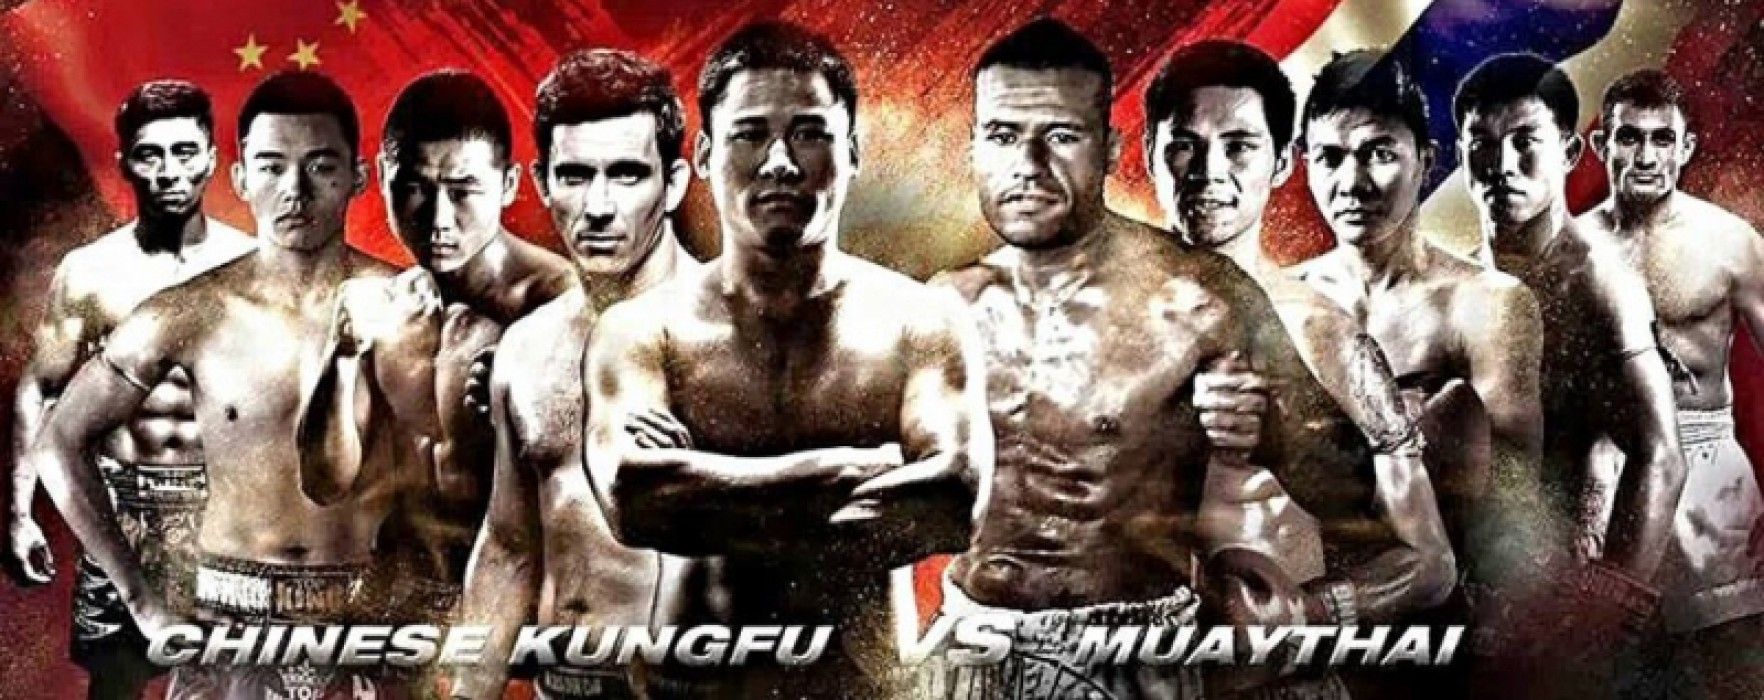 Kunlun Fight 1 World Tour: Chinese Kungfu vs Muay Thai with Kulebin, Aekpracha and many others